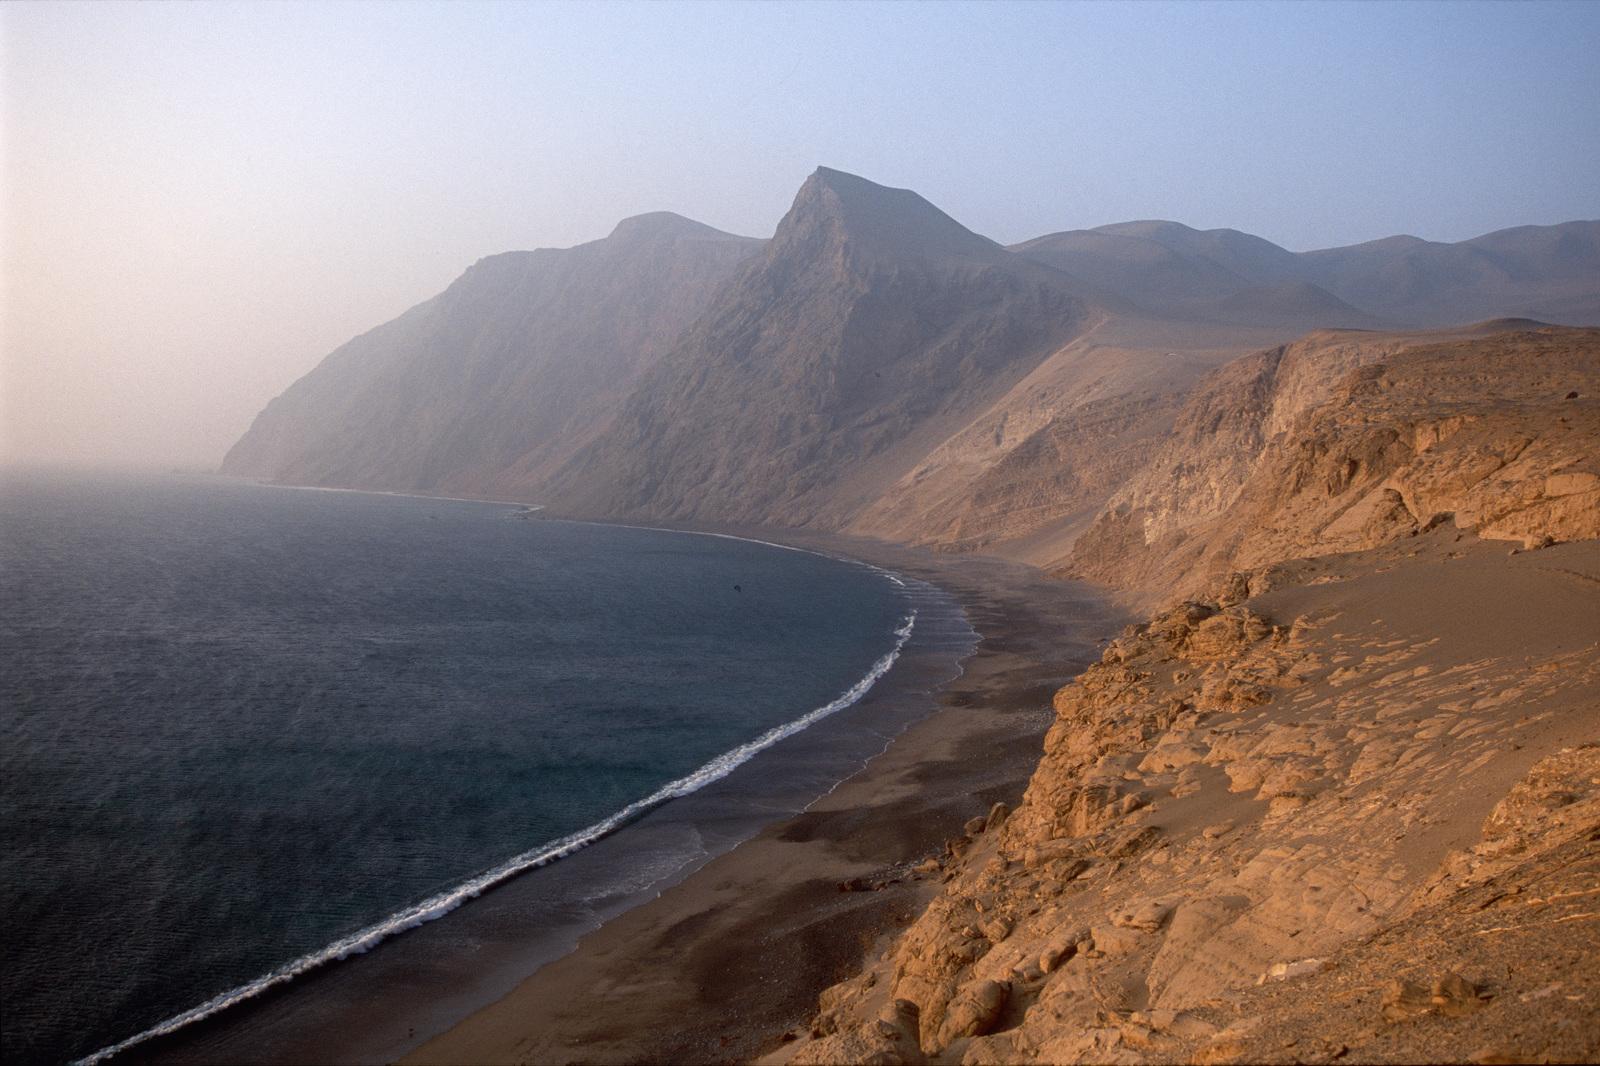 Mountains meet the sea along the coastline of Peru. Photo ©Cristobal Corral Vega.